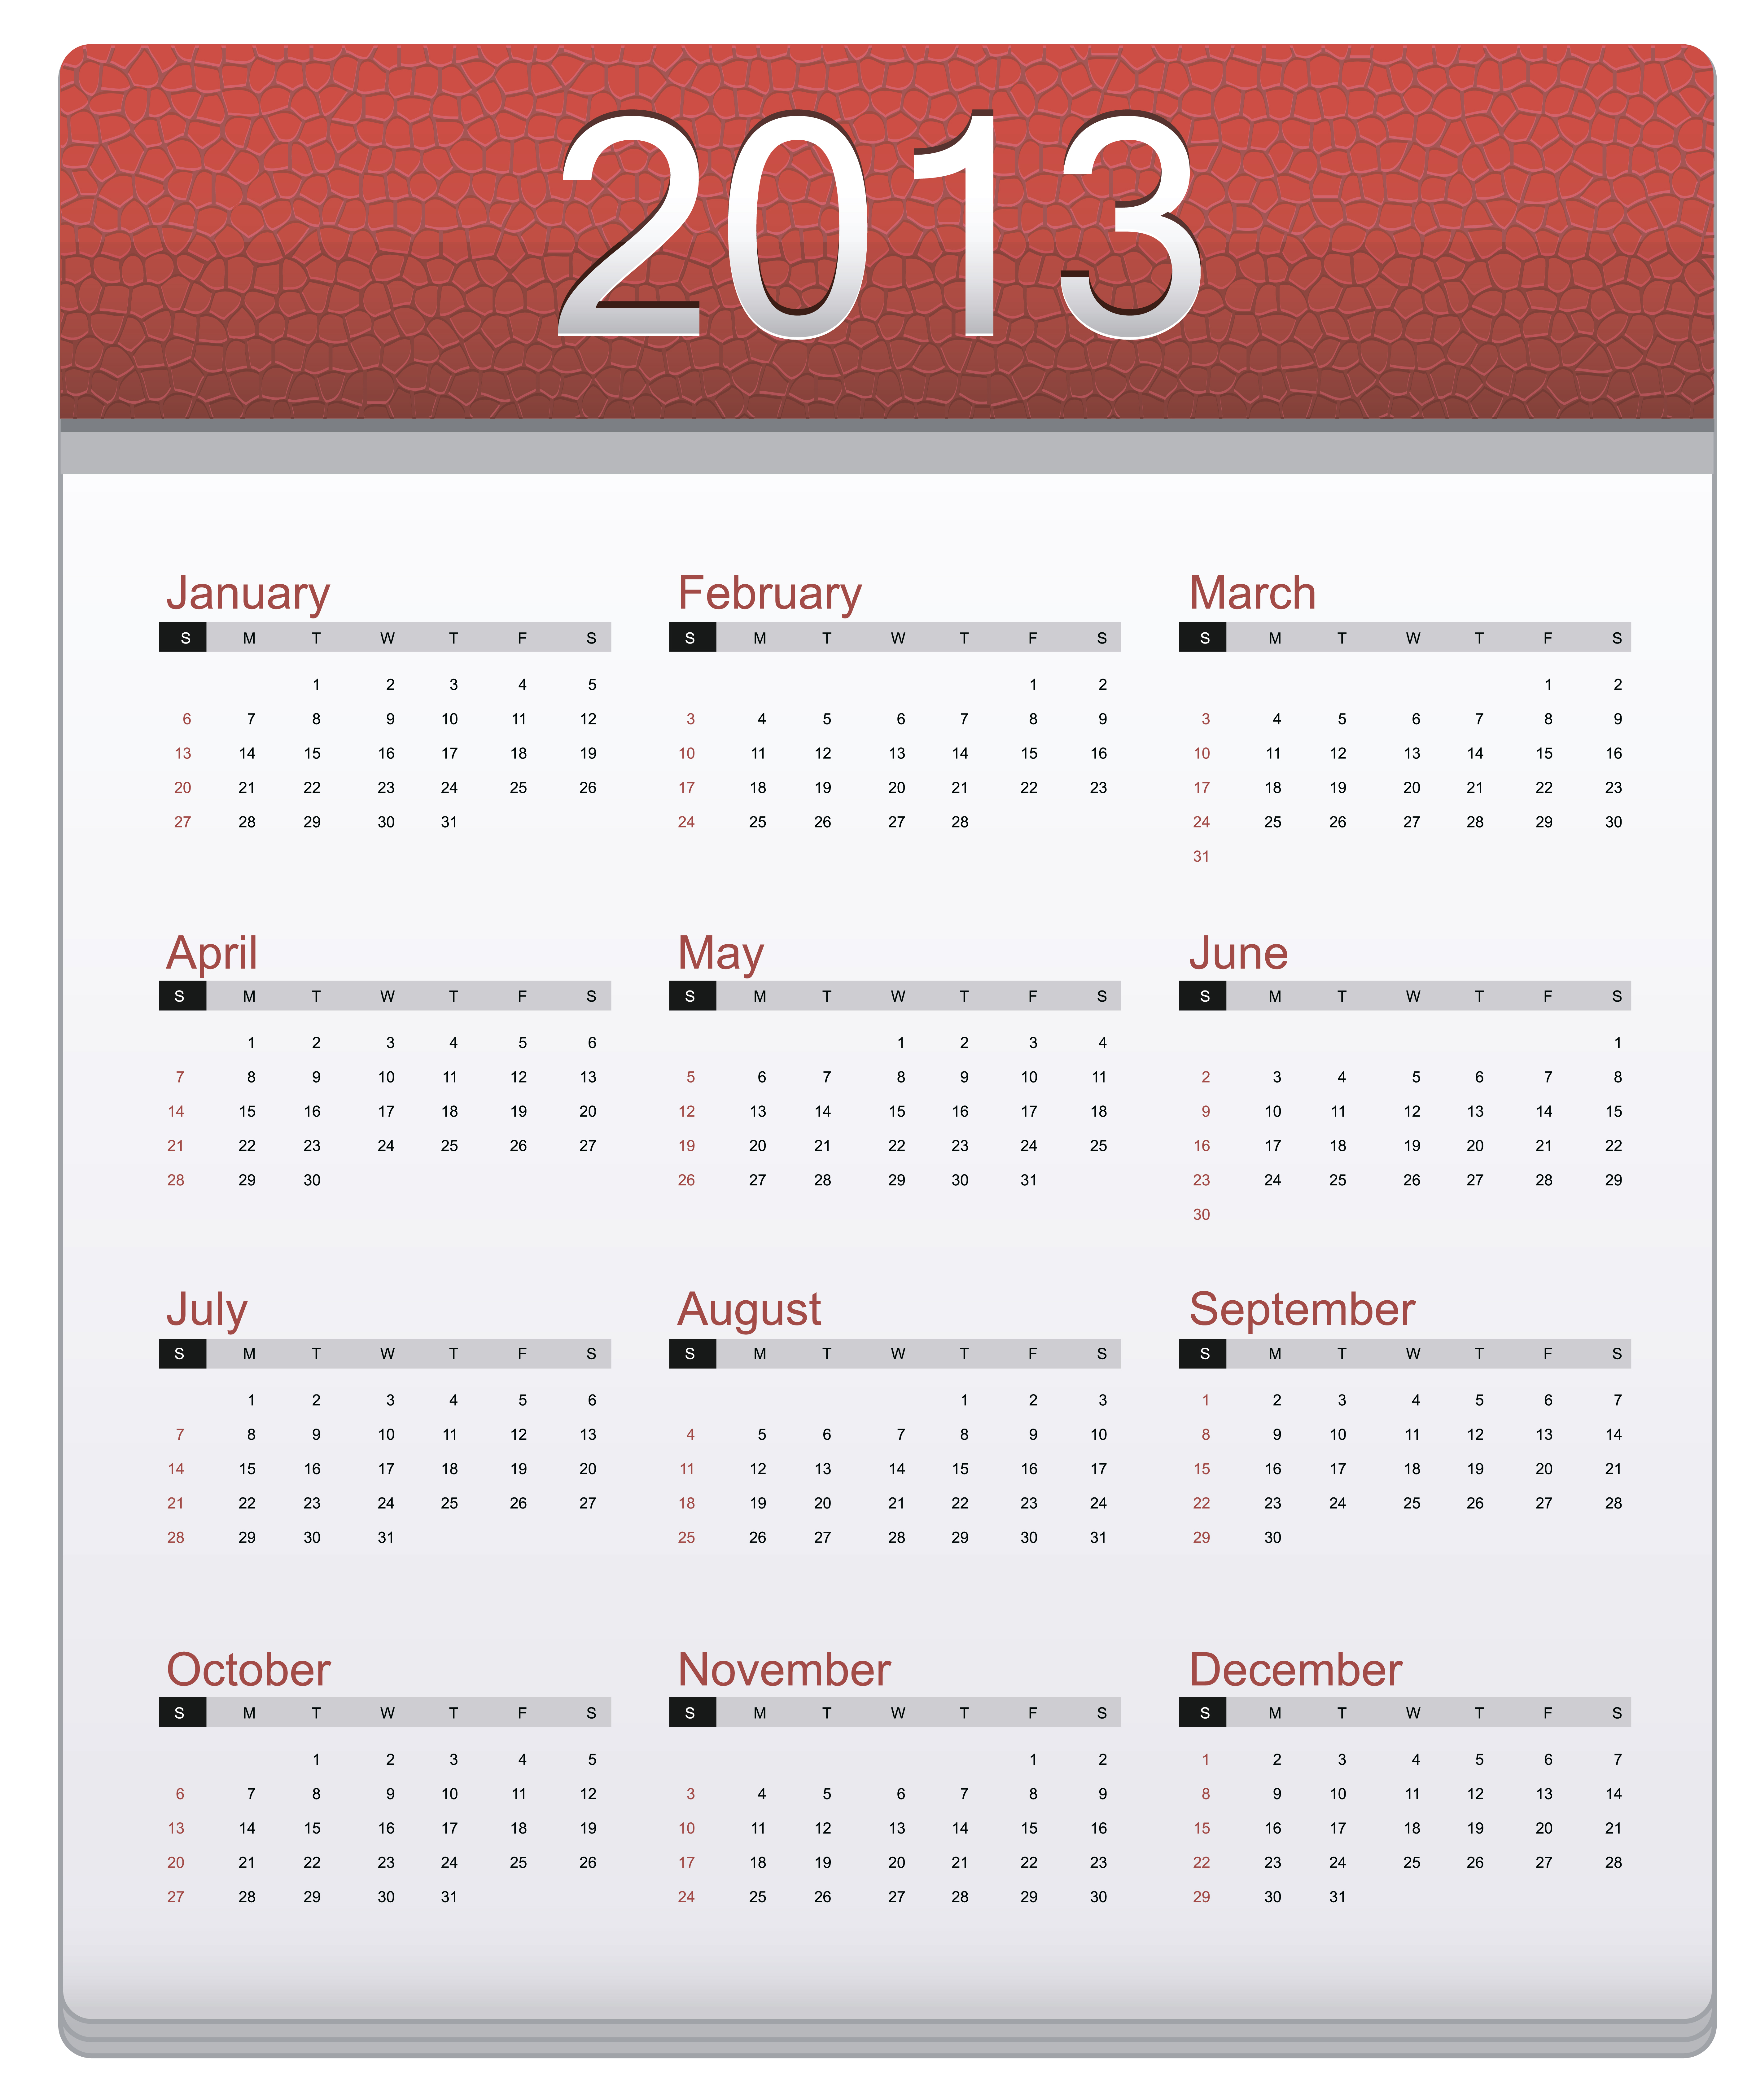 Calendario con foto 2013 para imprimir gratis 9